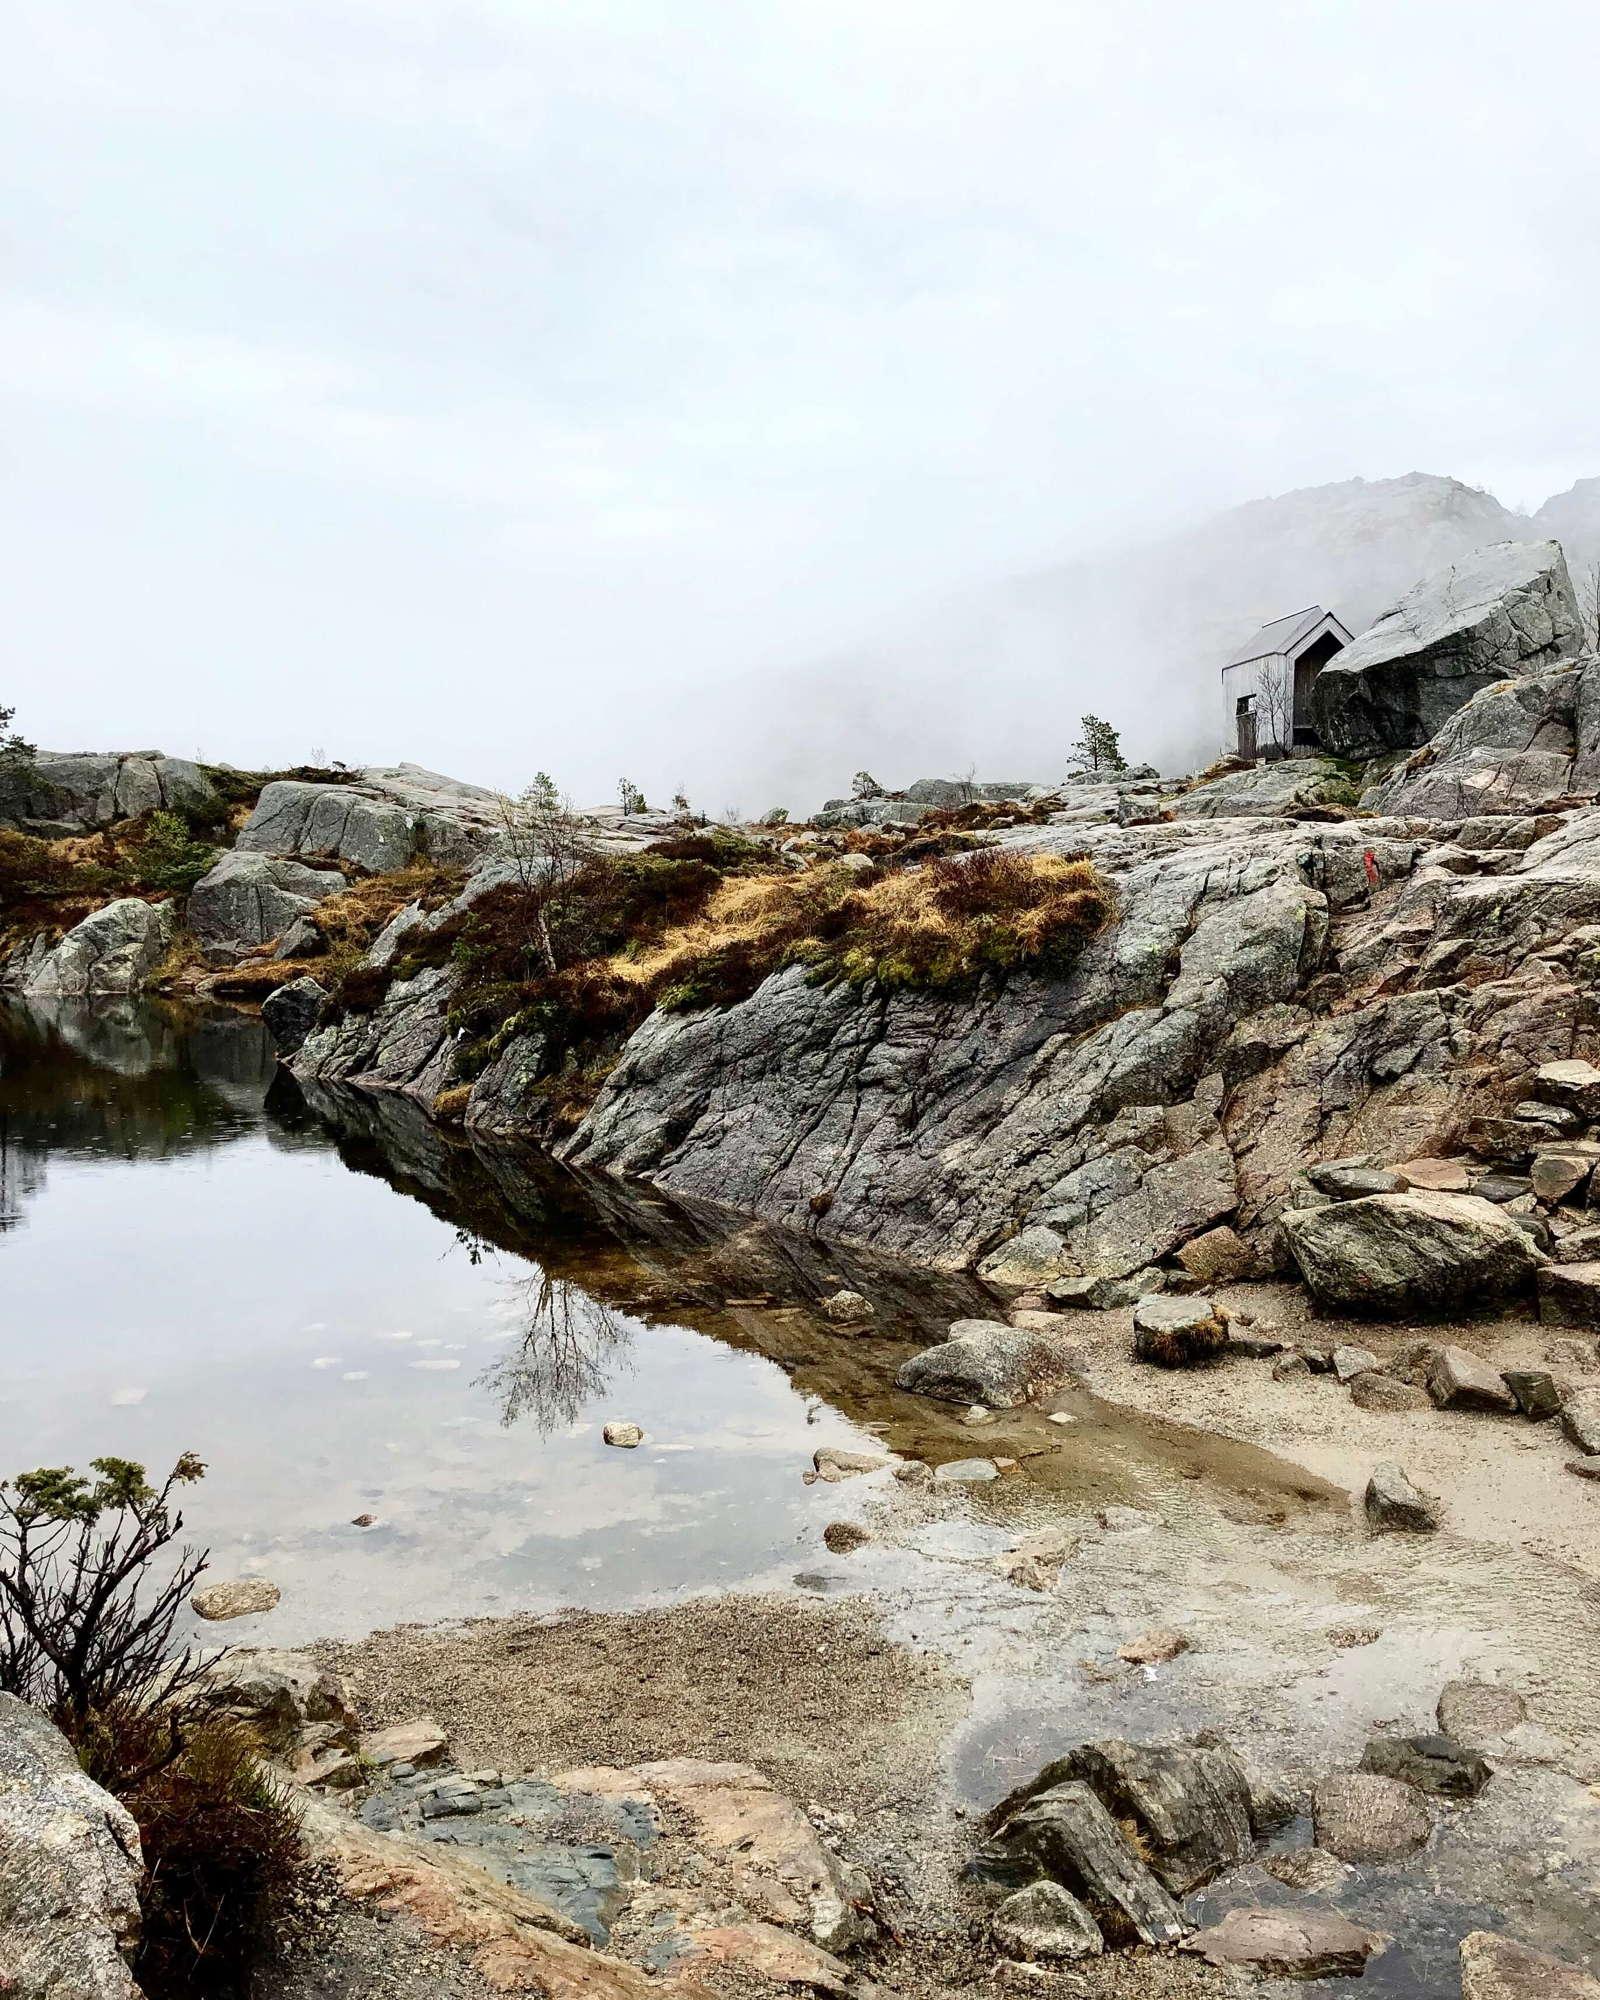 hiking-preikestolen-pulpit-rock-norway